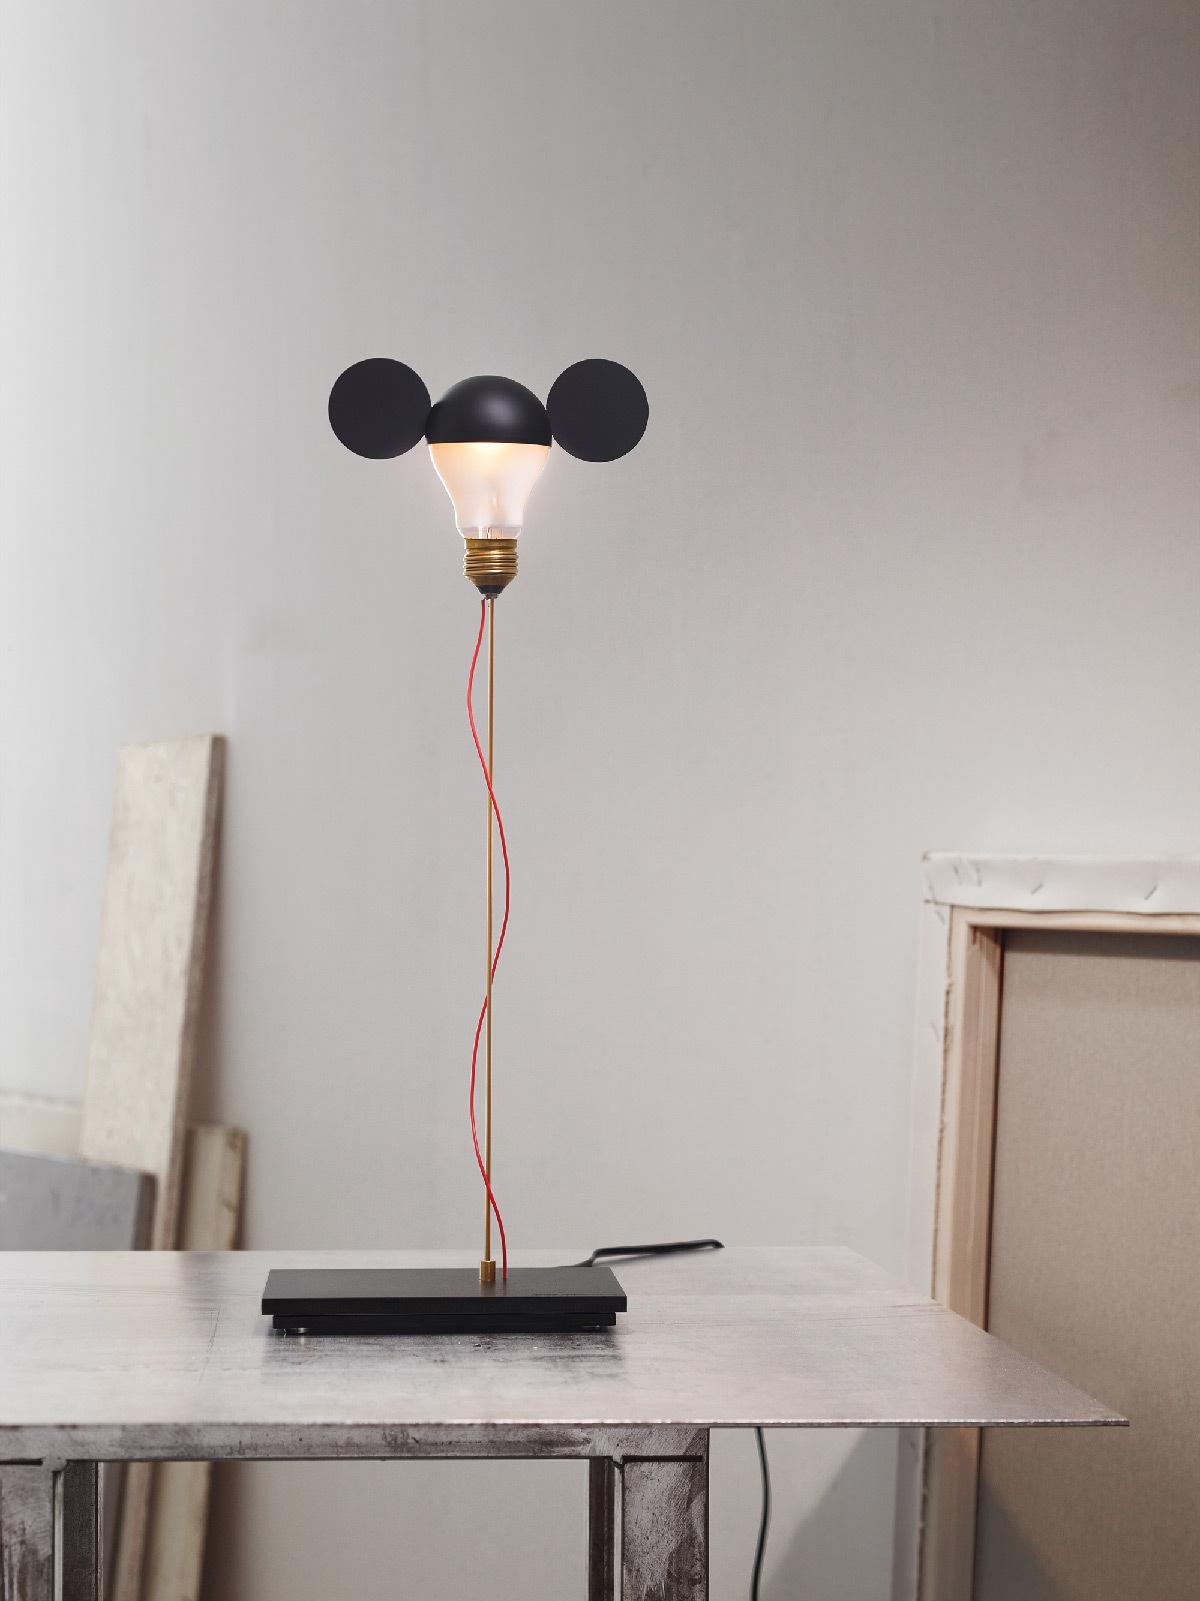 I Ricchi Poveri - Toto noir - Monument for a Bulb, 2014 - Designer : Ingo Maurer © Ingo Maurer GmbH, Munich